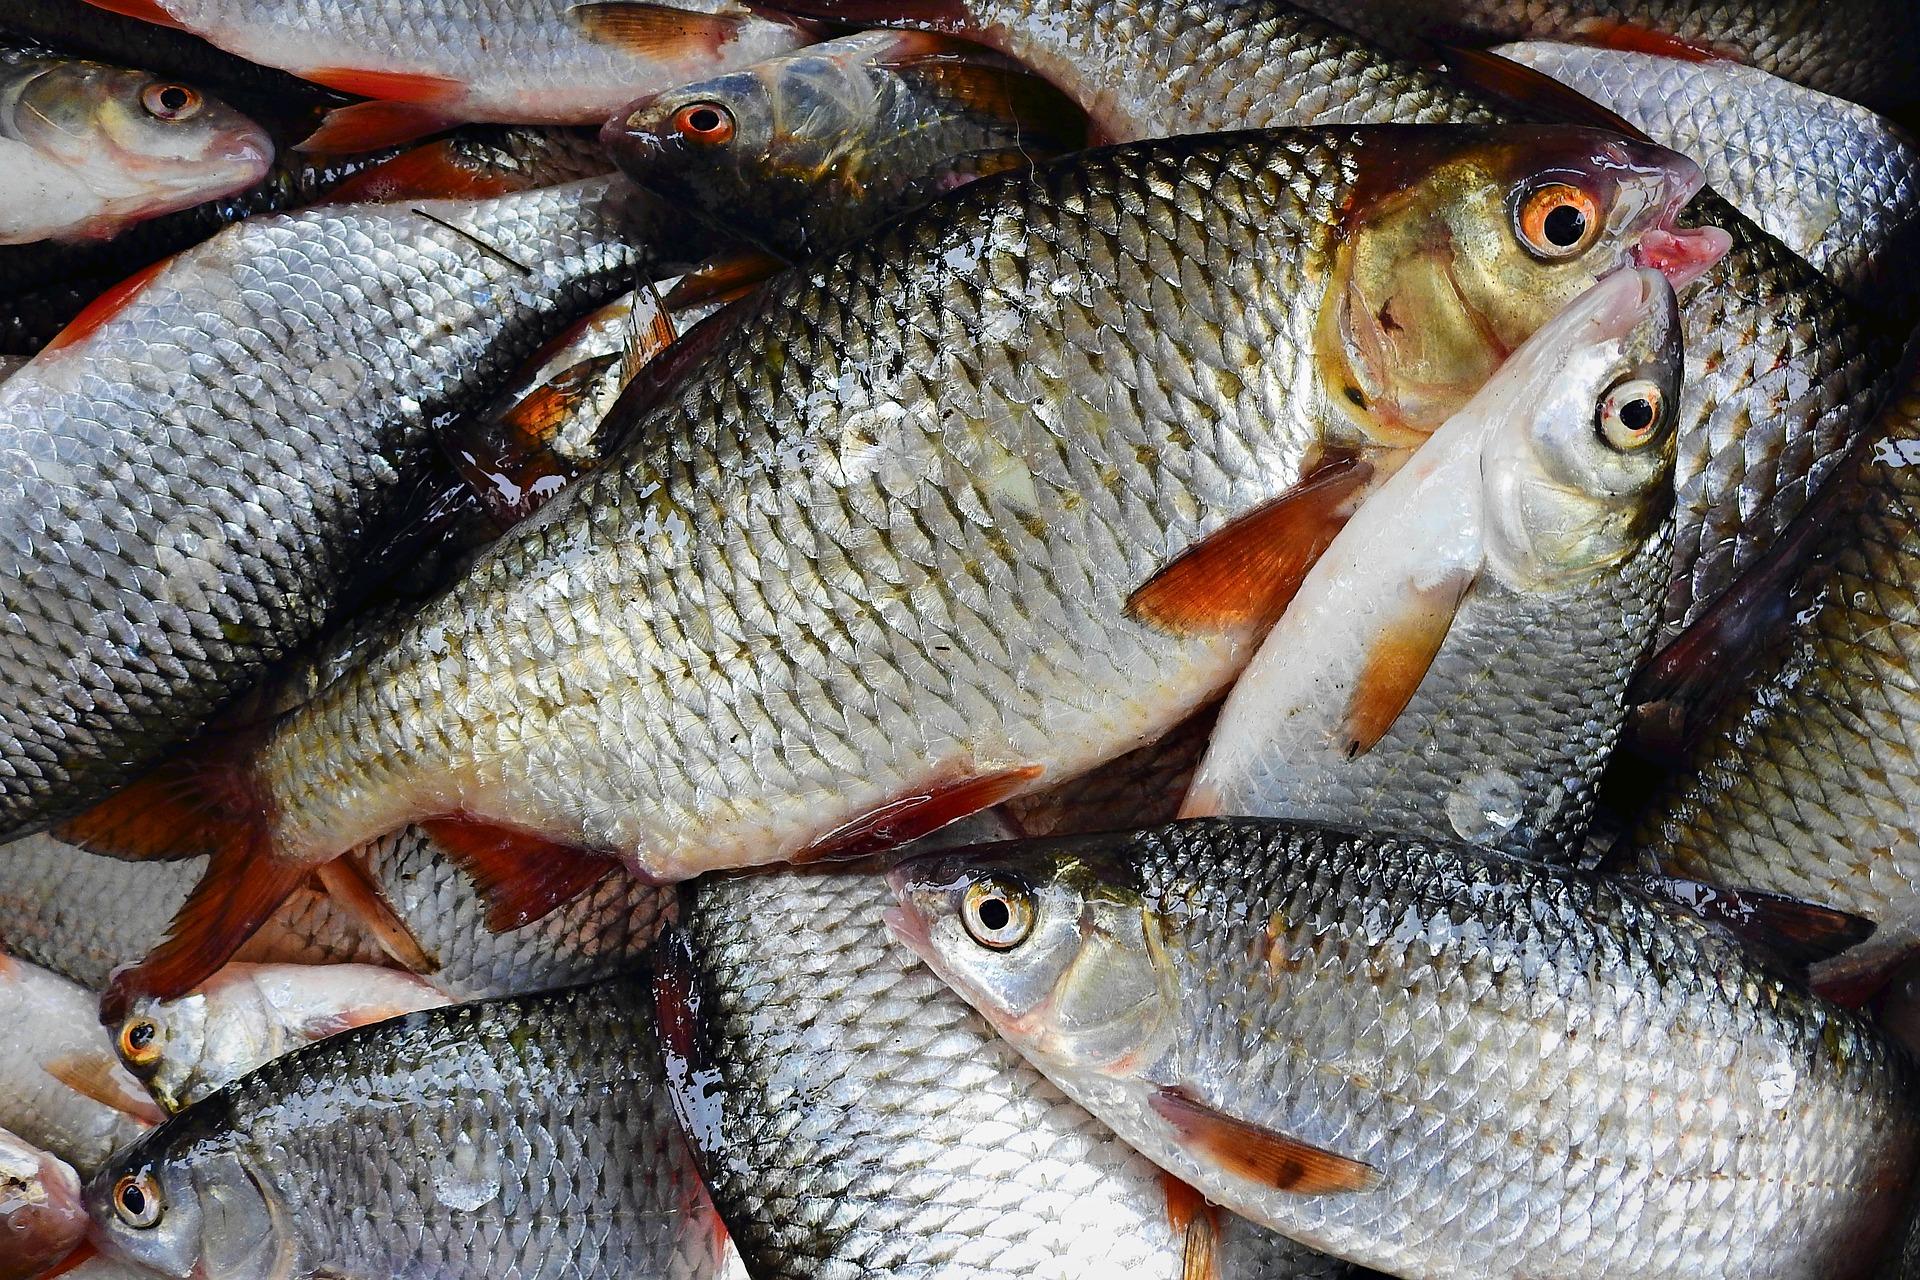 fish-3993416_1920.jpg